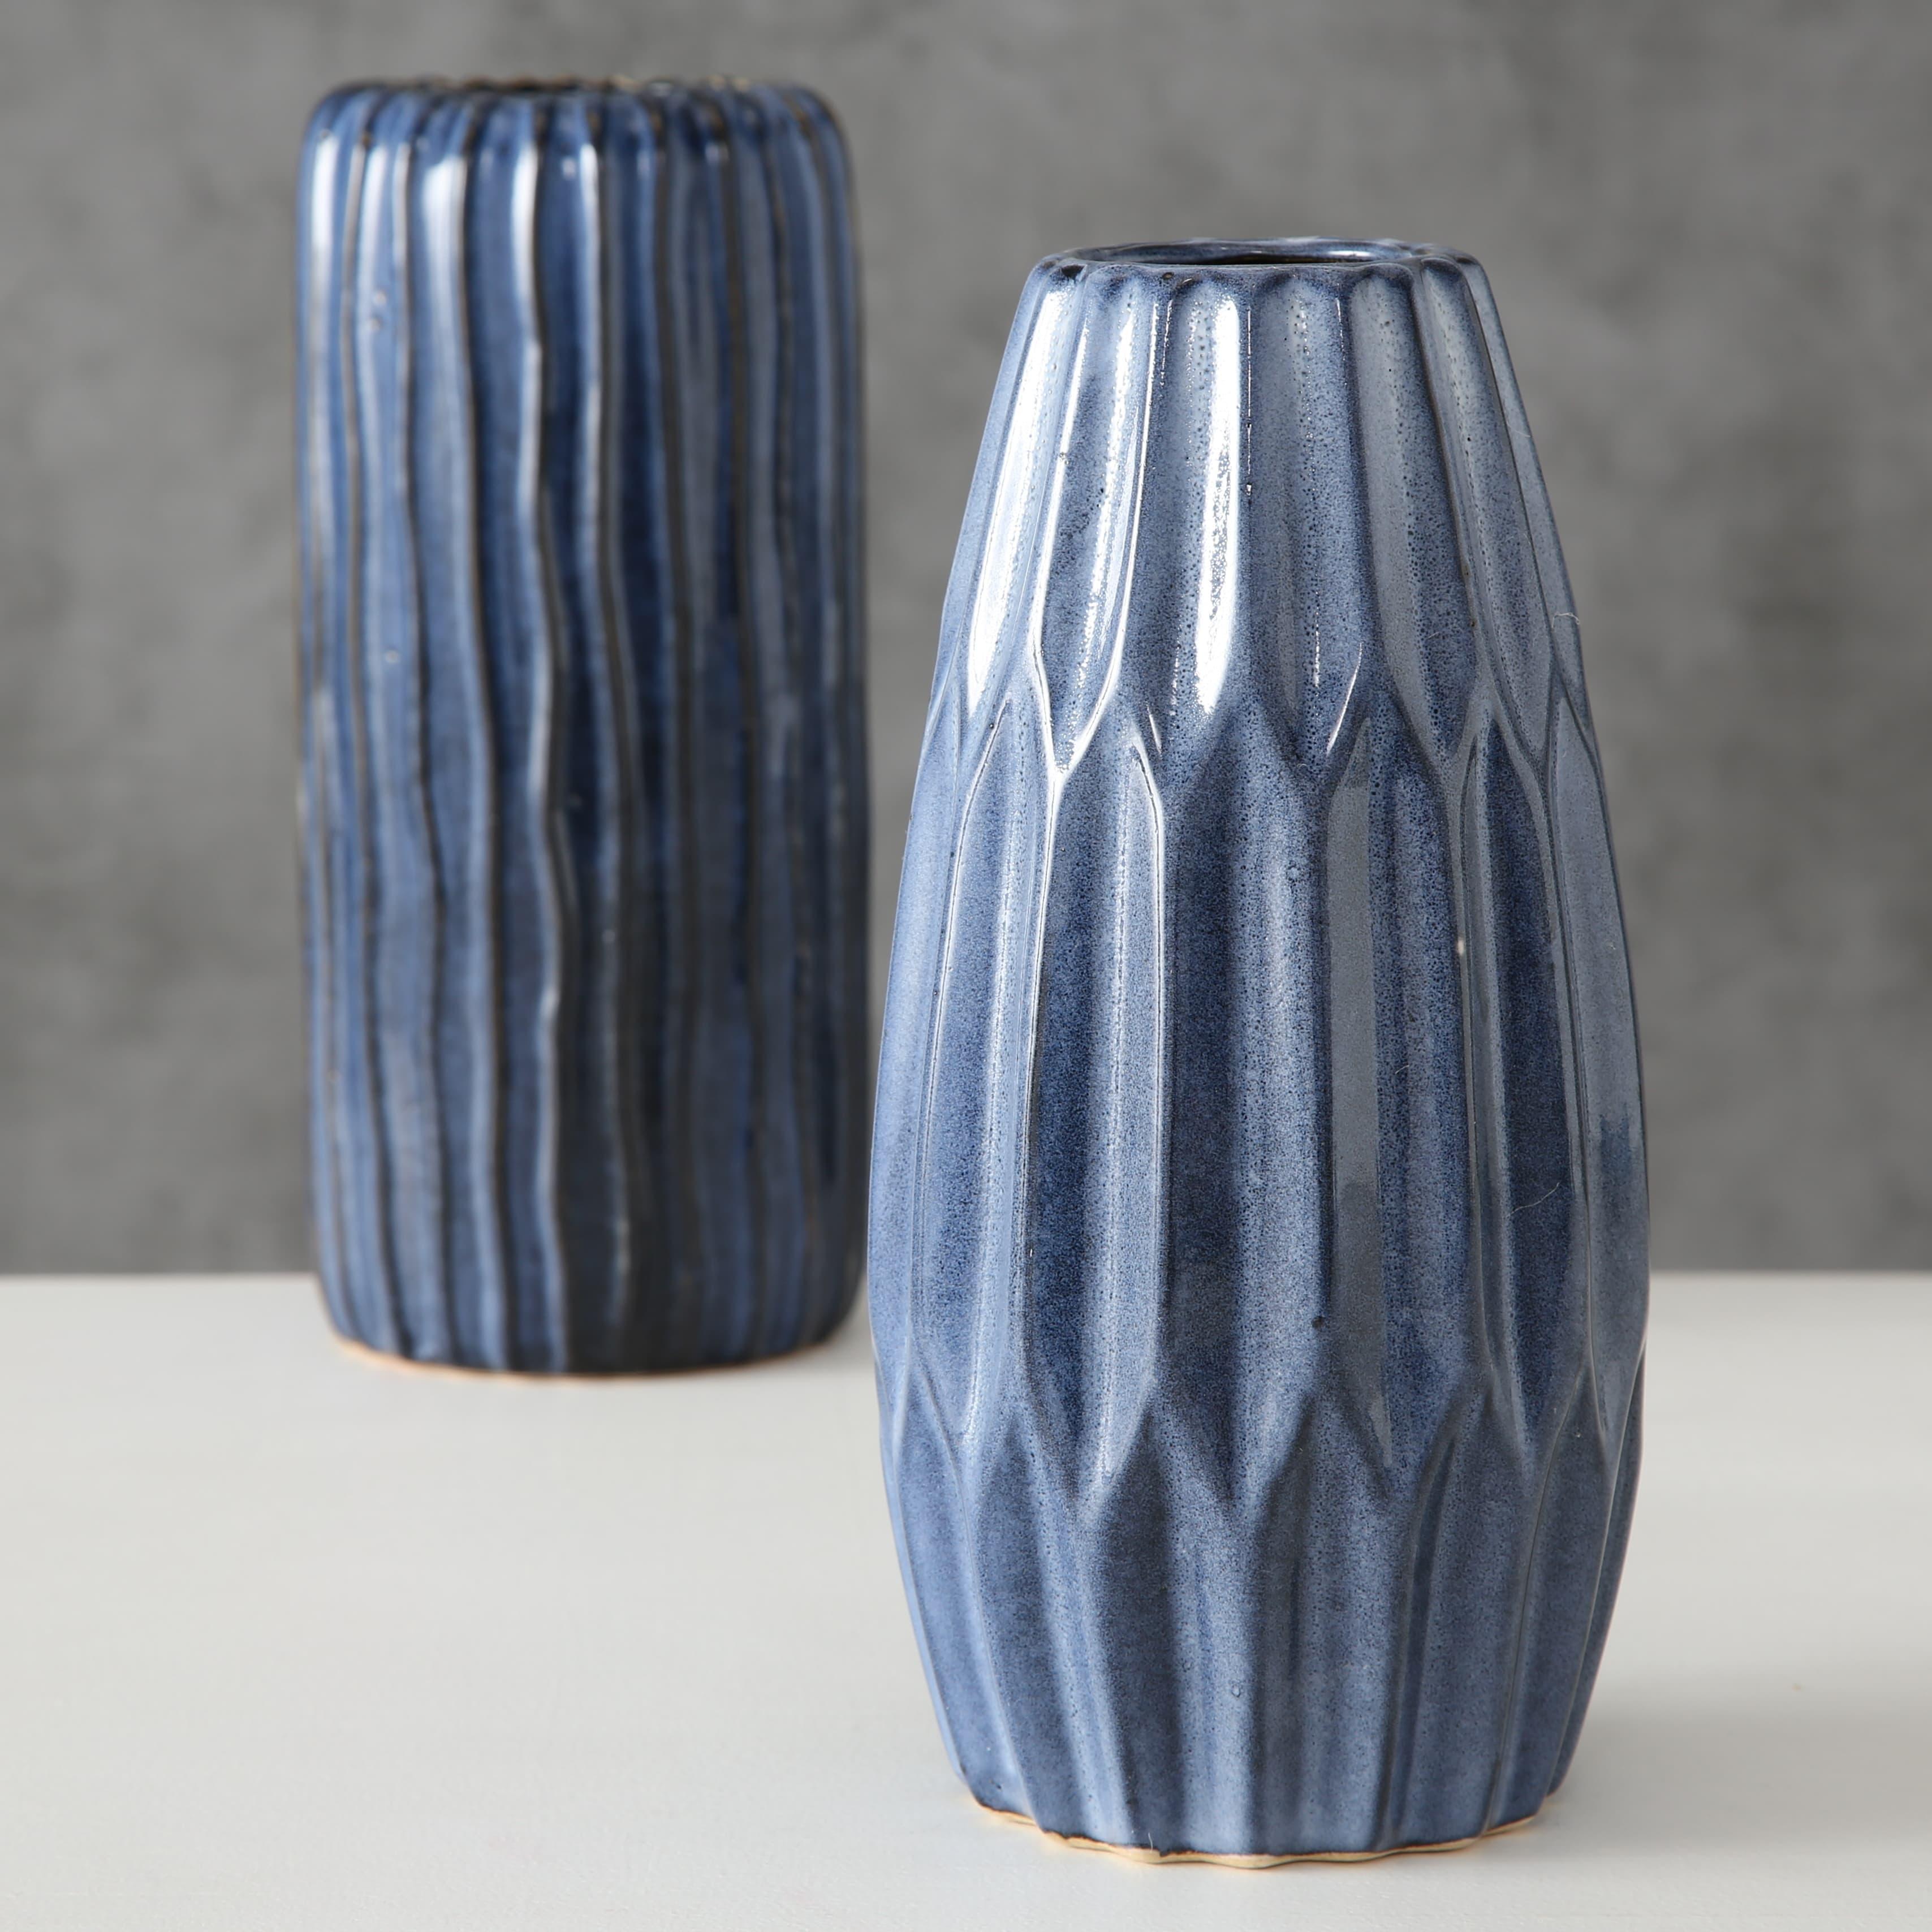 Vaza decorativa din portelan Aquarel Albastru, Modele Asortate, Ø10xH24 cm